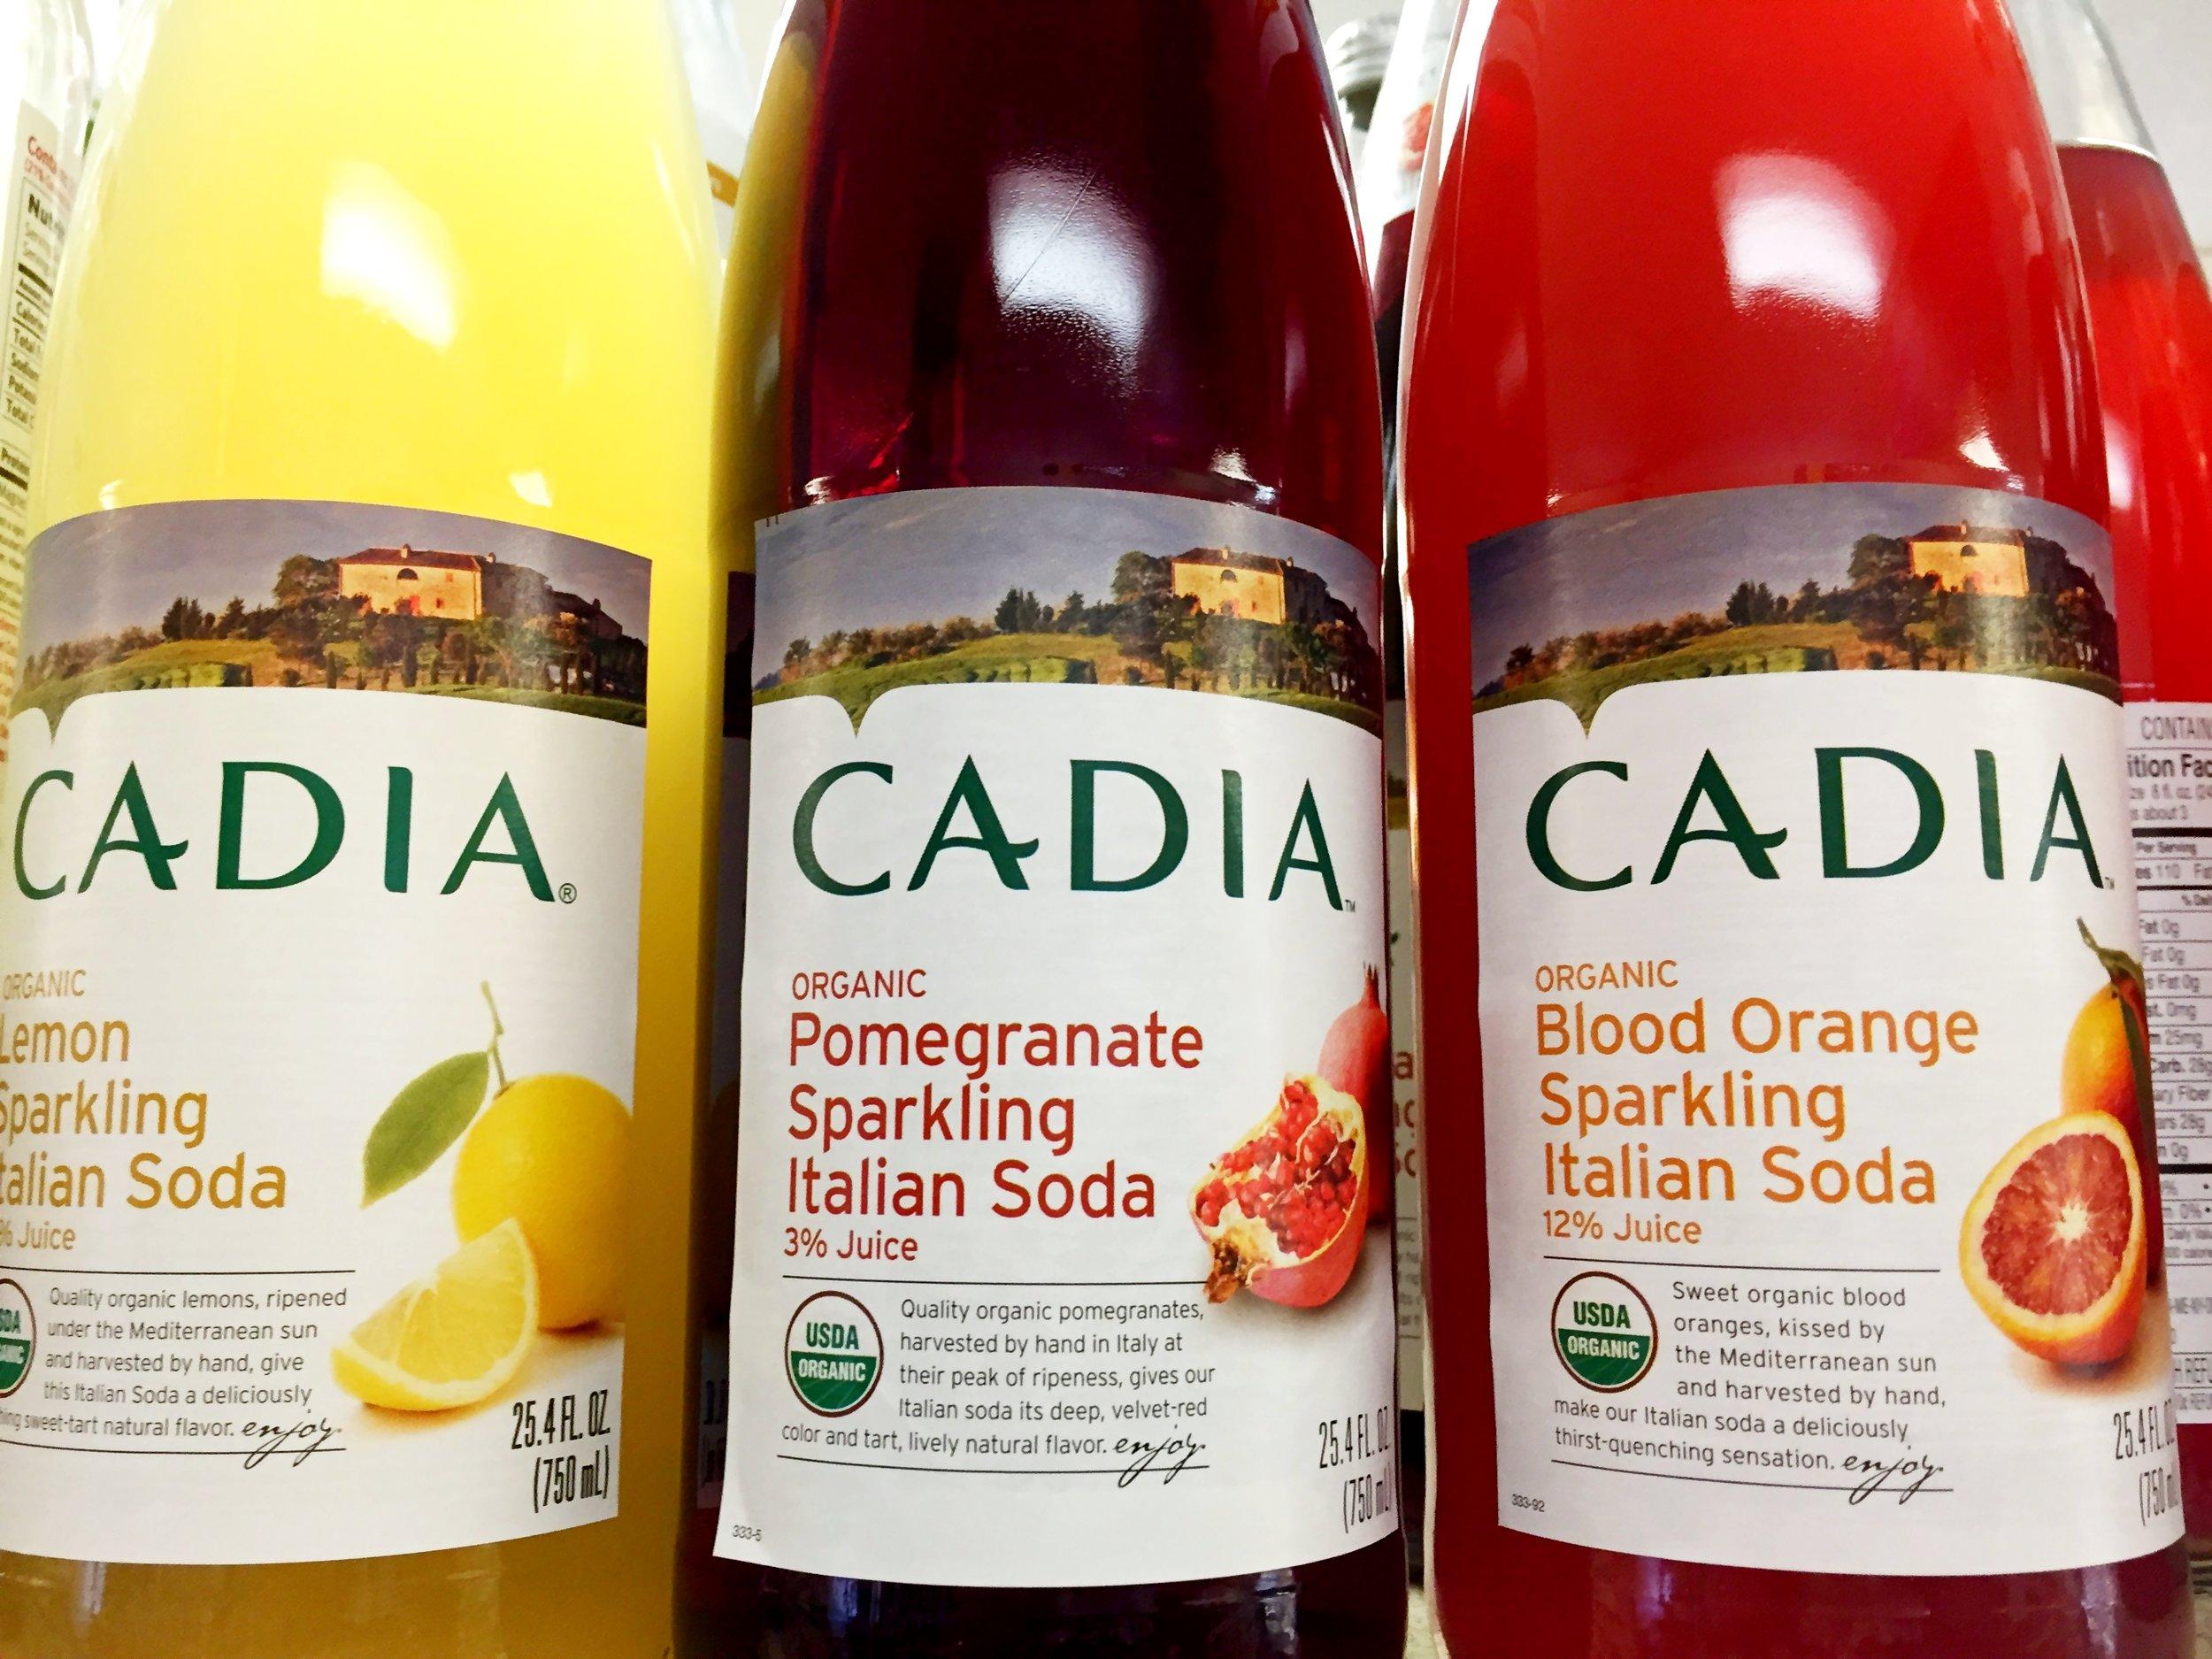 Cadia Sparkling Soda